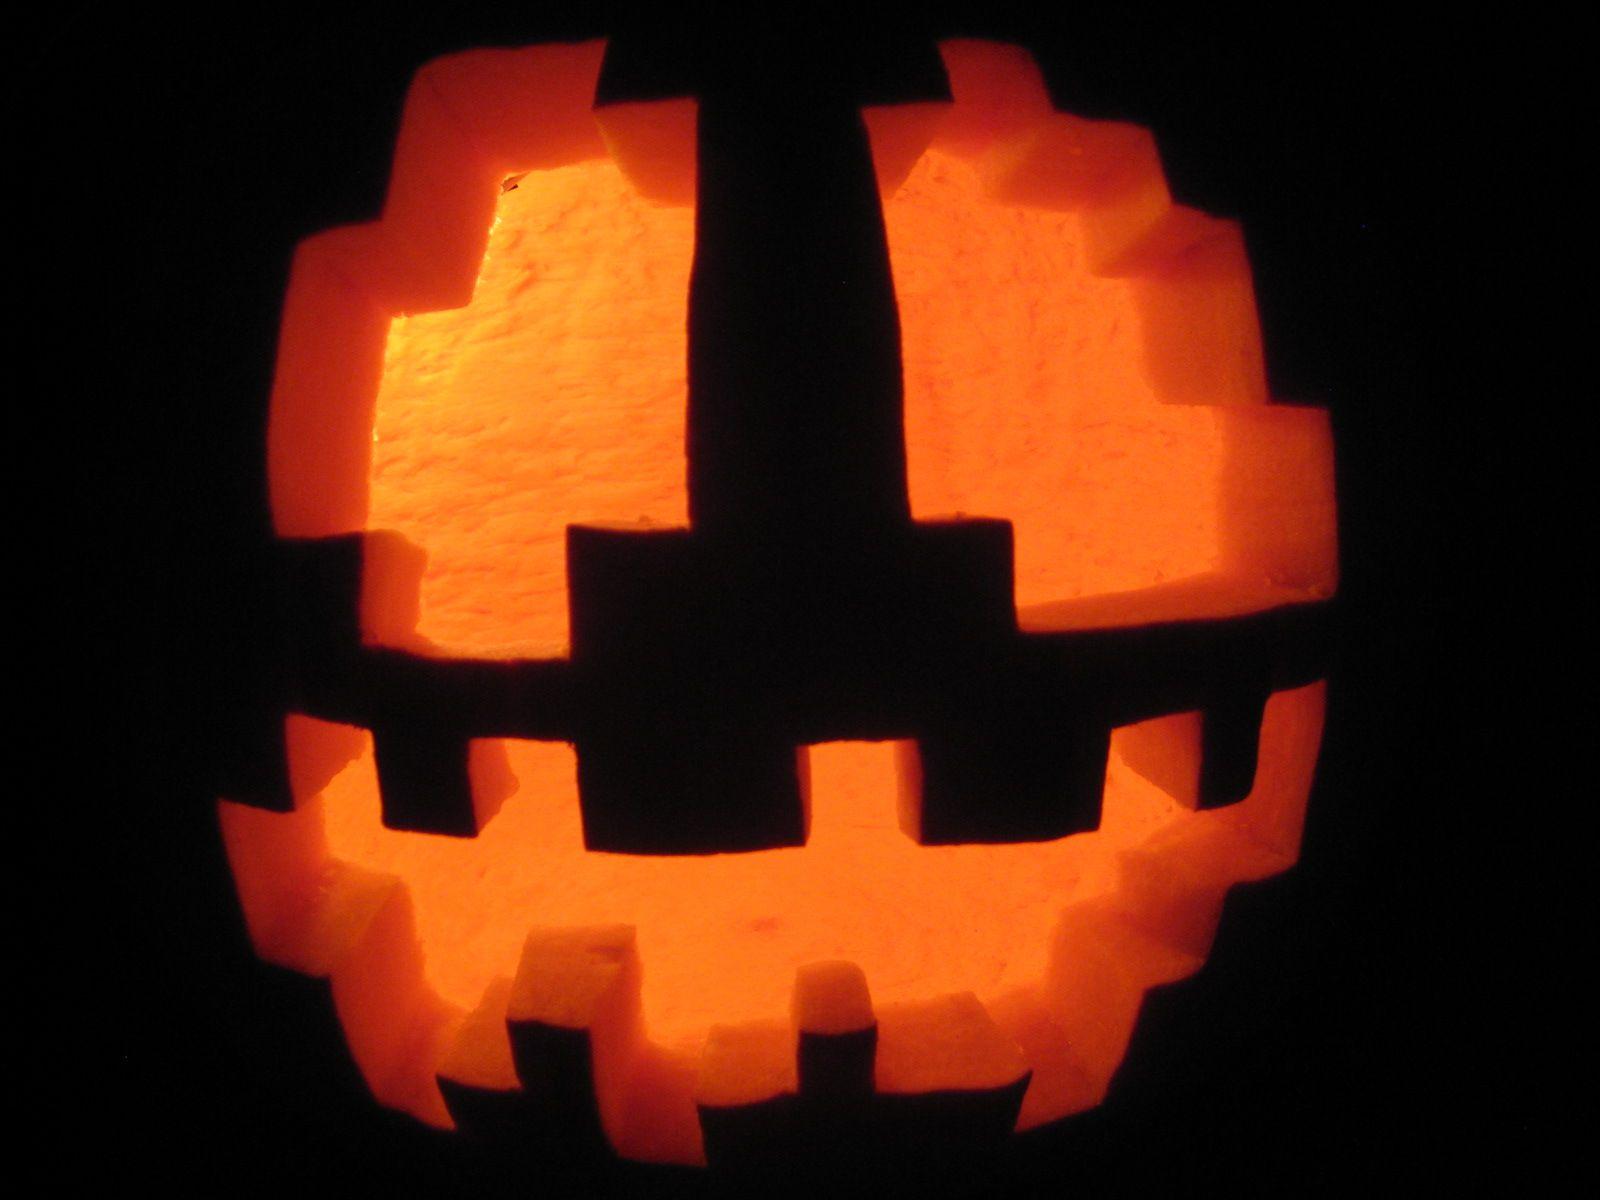 minecraft pumpkin | craft ideas | pinterest | minecraft pumpkin